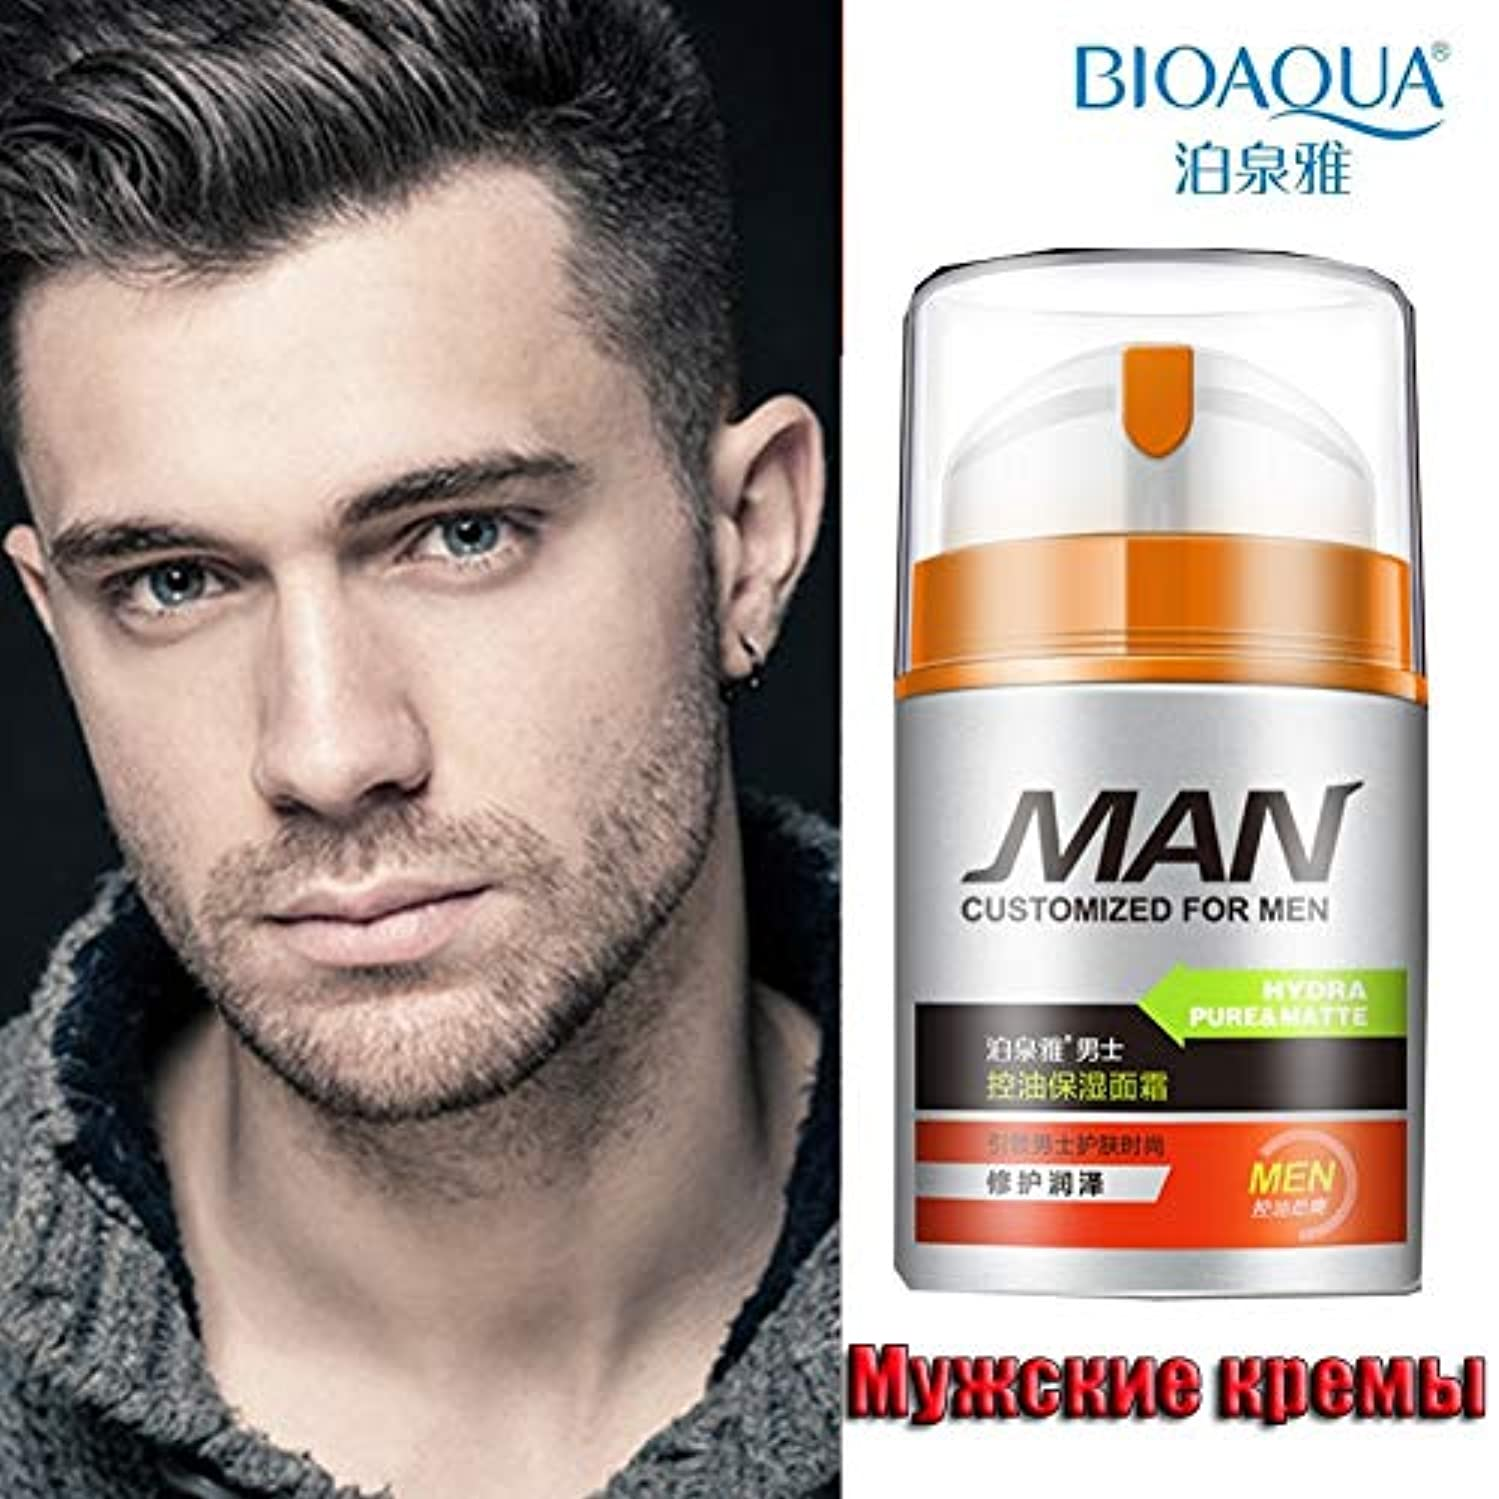 Bioaquaフェイスケアダイナミック男性保湿クリーム保湿アンチリンクルモイスチャライジングミルク男性ケア製品